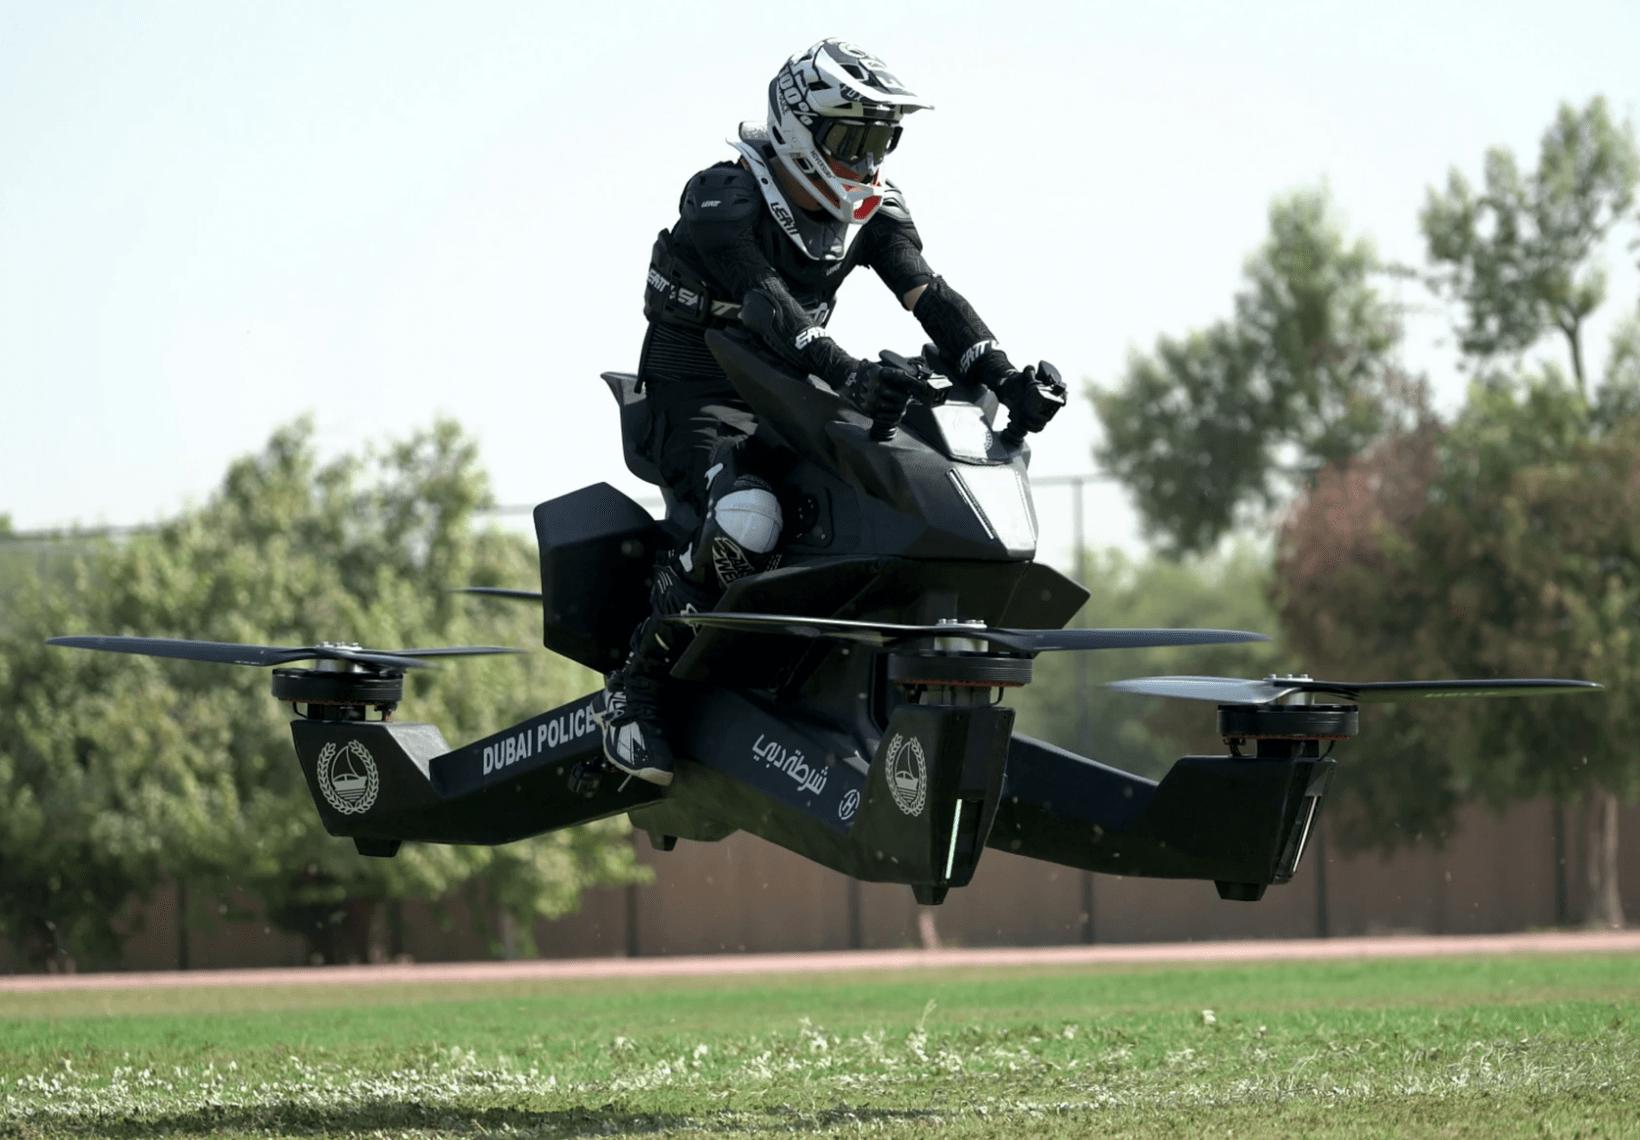 cars, bikes, motorbike, flyer, hoversurf, scorpion